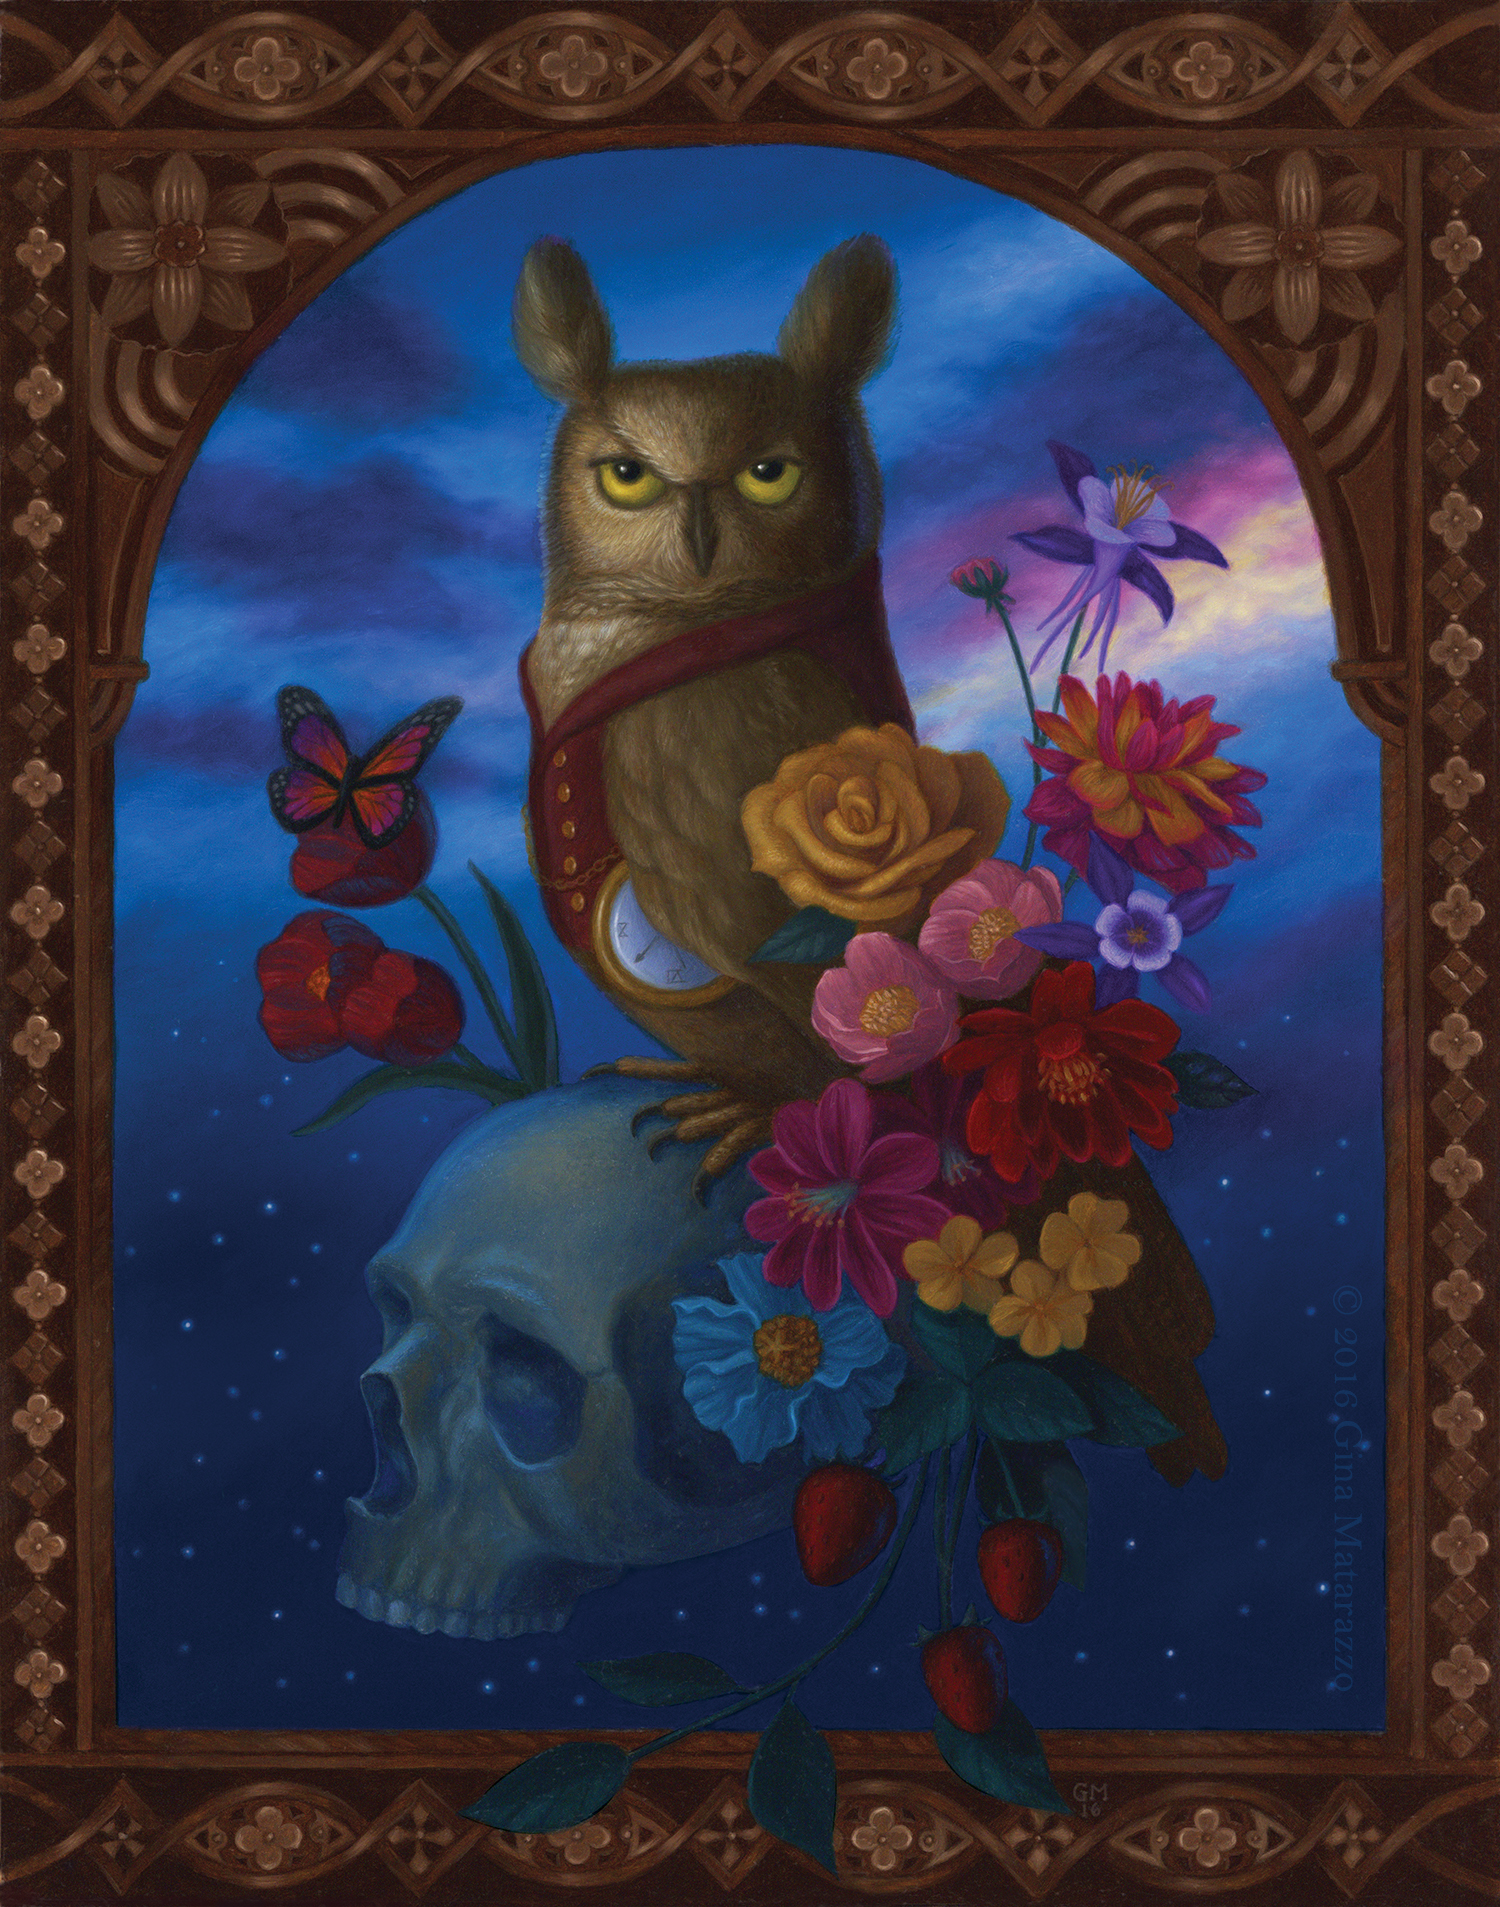 owl_night_flowers_skull_illustration_imaginative_realism_gina_matarazzo.jpg